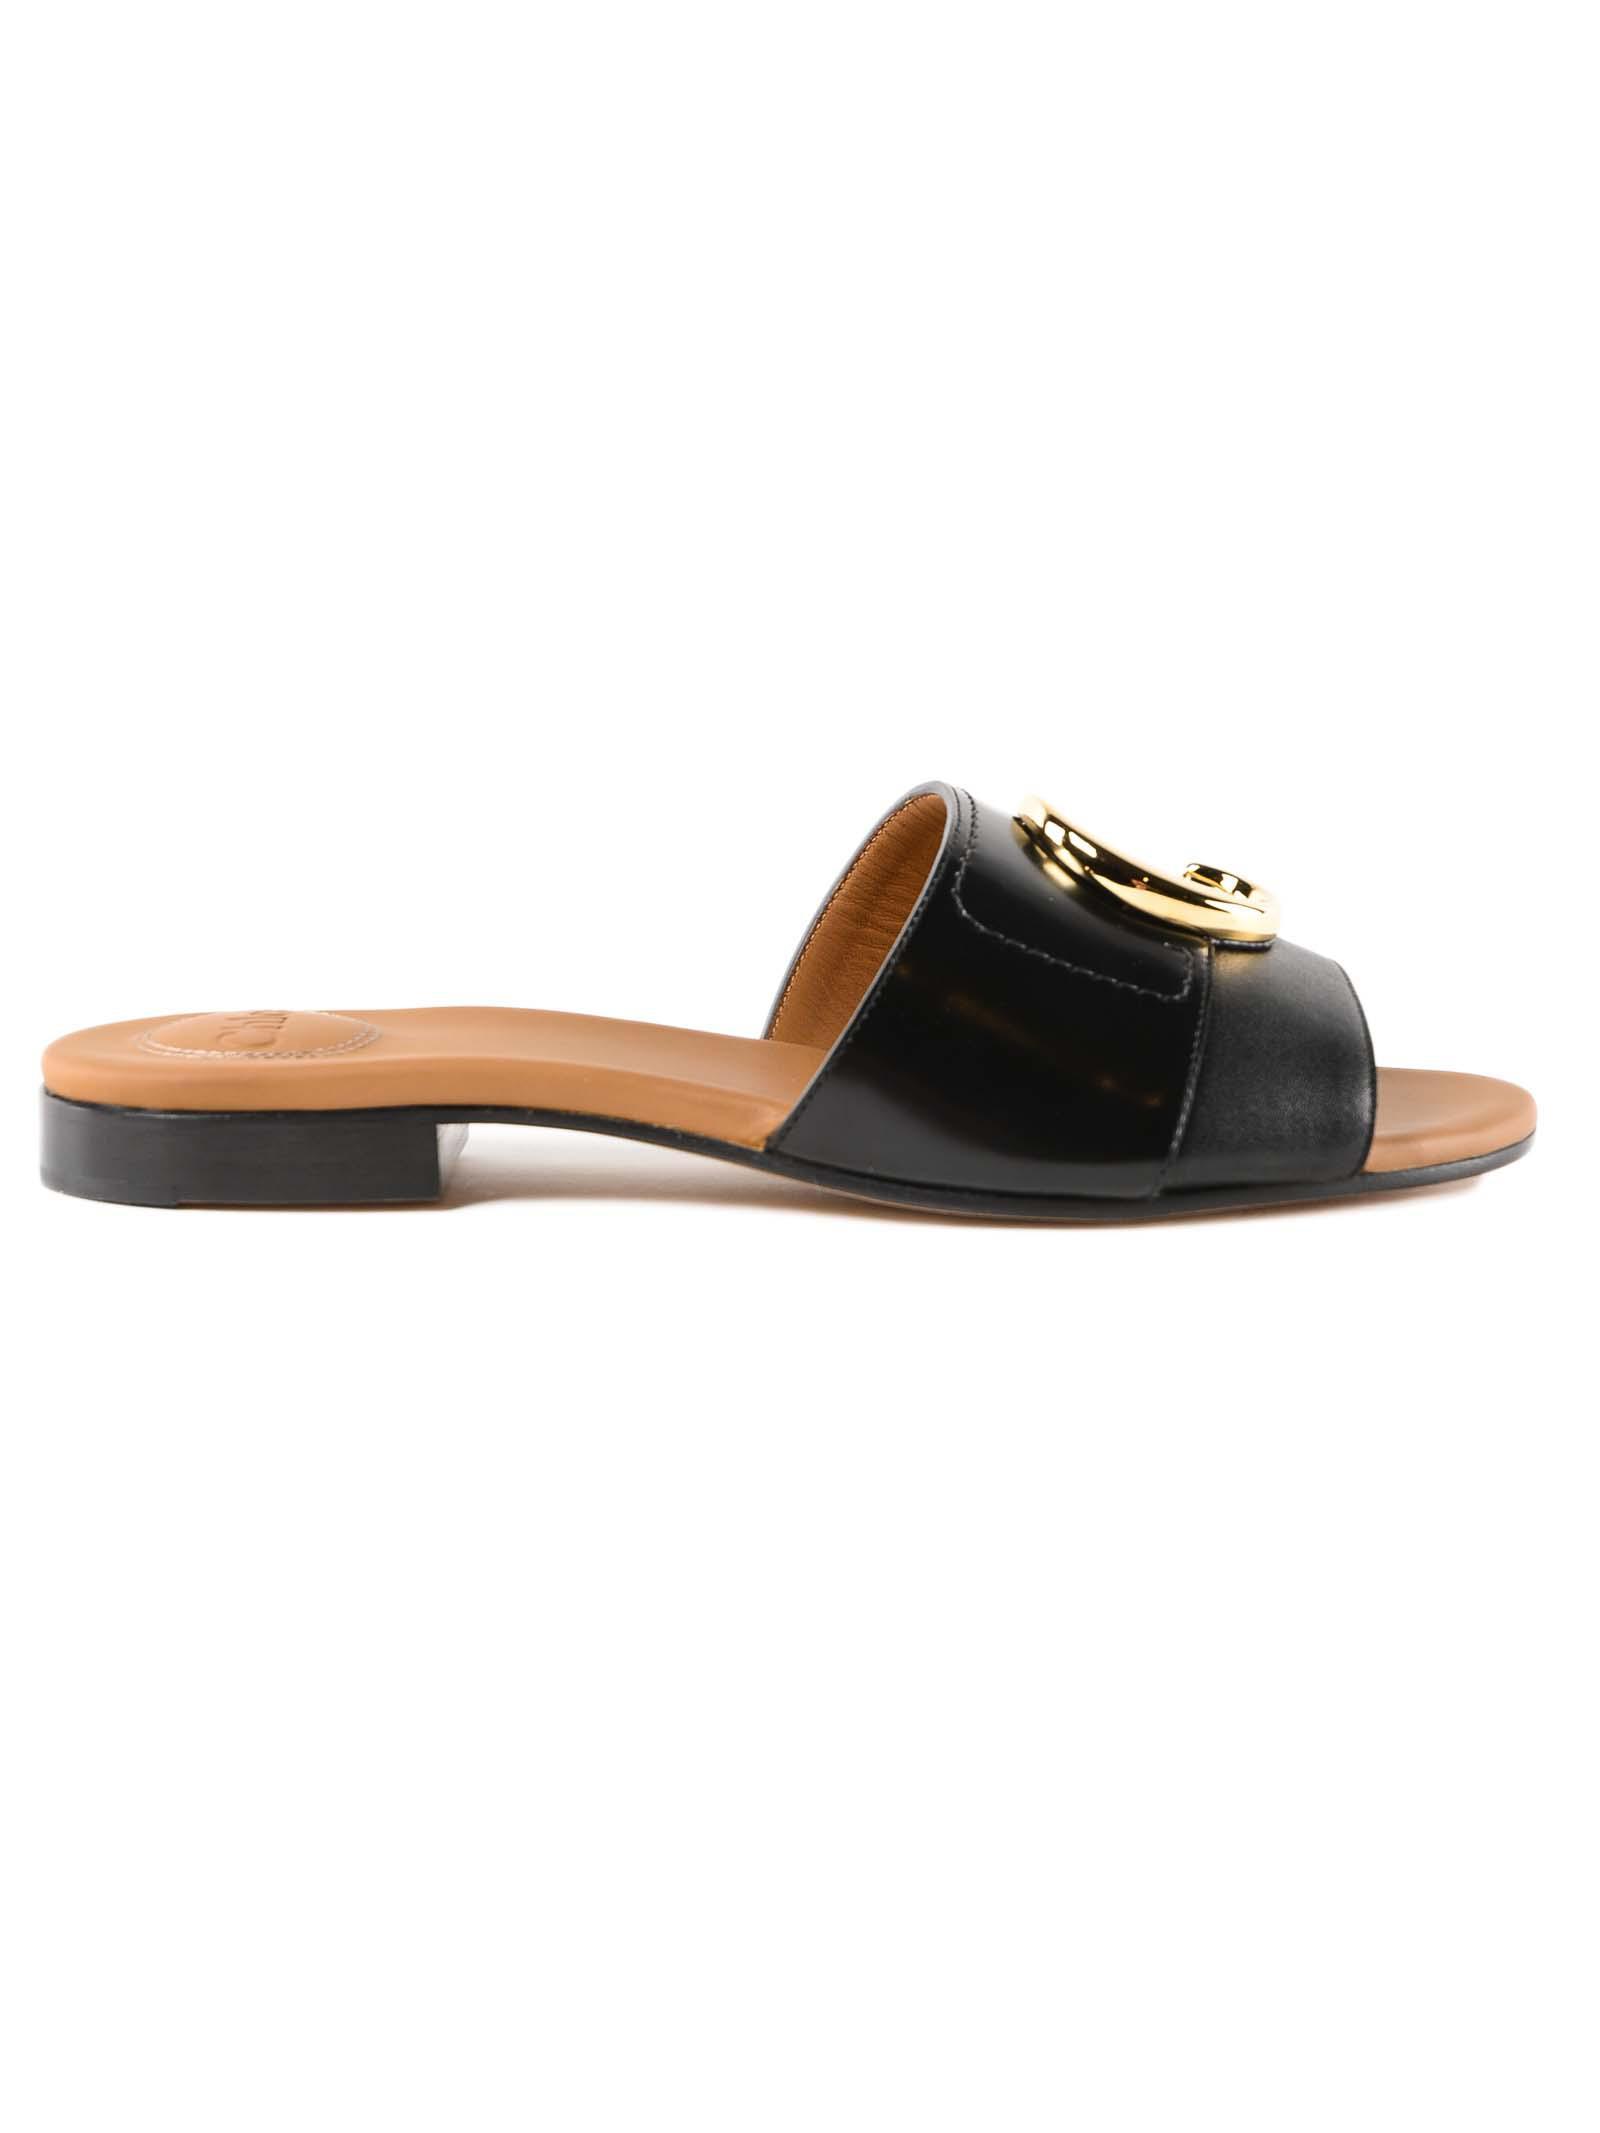 Chloé In Sandal Chloe Black Lyst Flat SVLGMpqUz